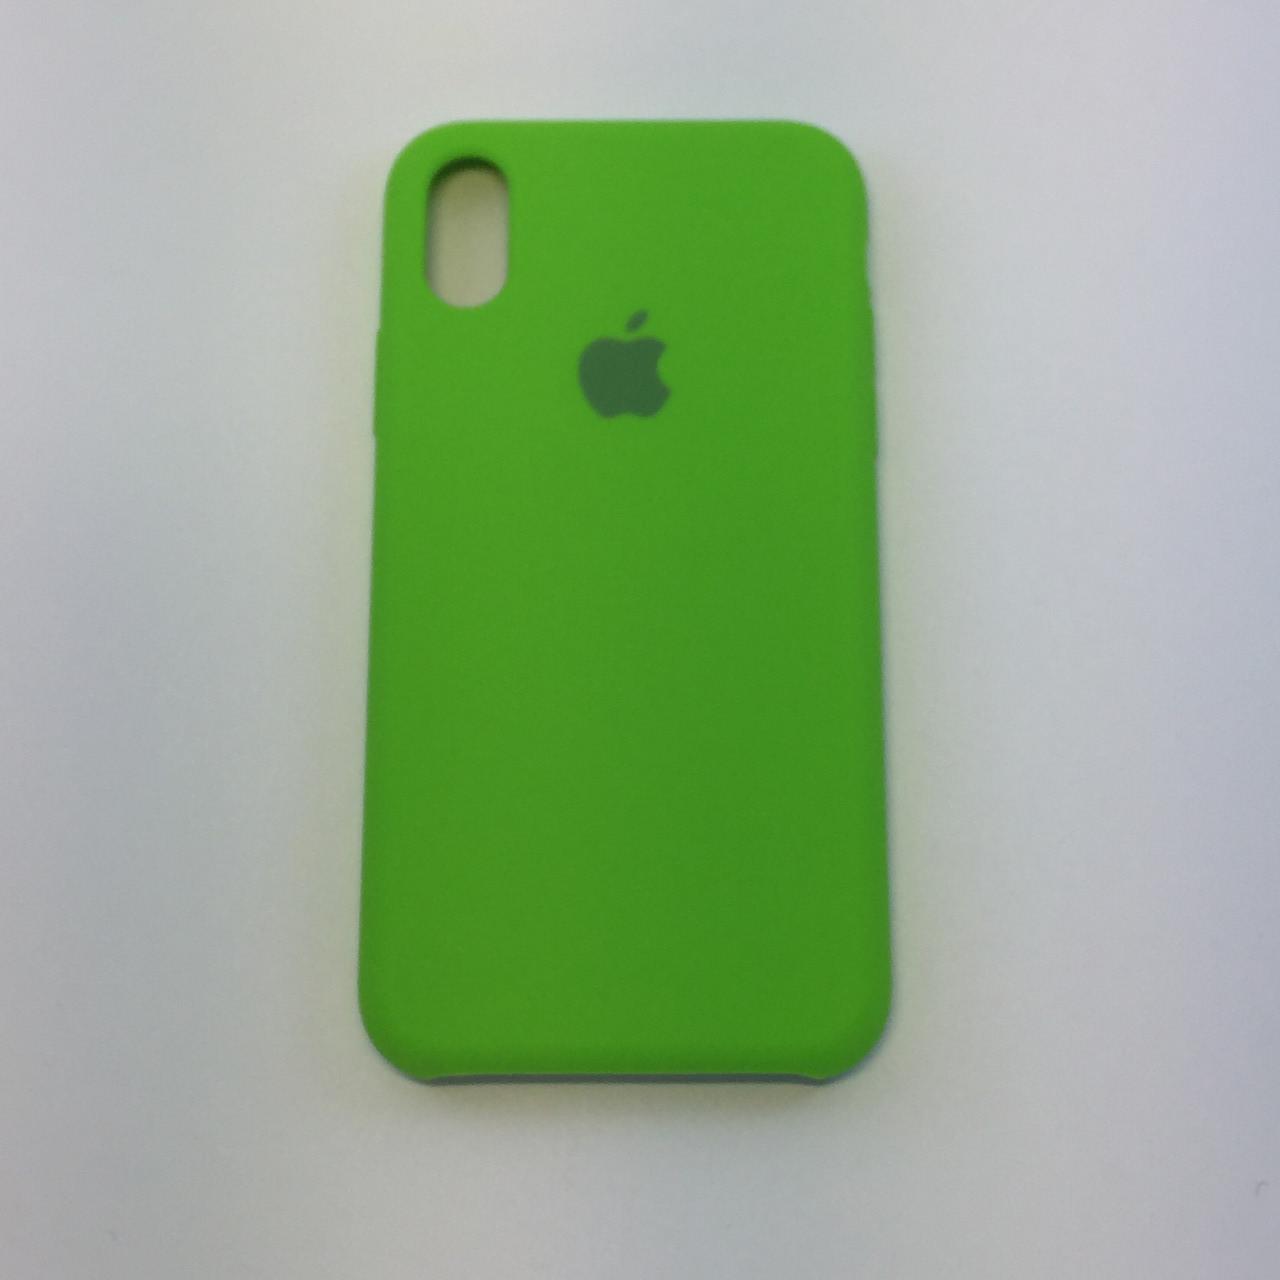 "Чехол - Silicon Case для iPhone ""Лайм - №31"" - copy orig."